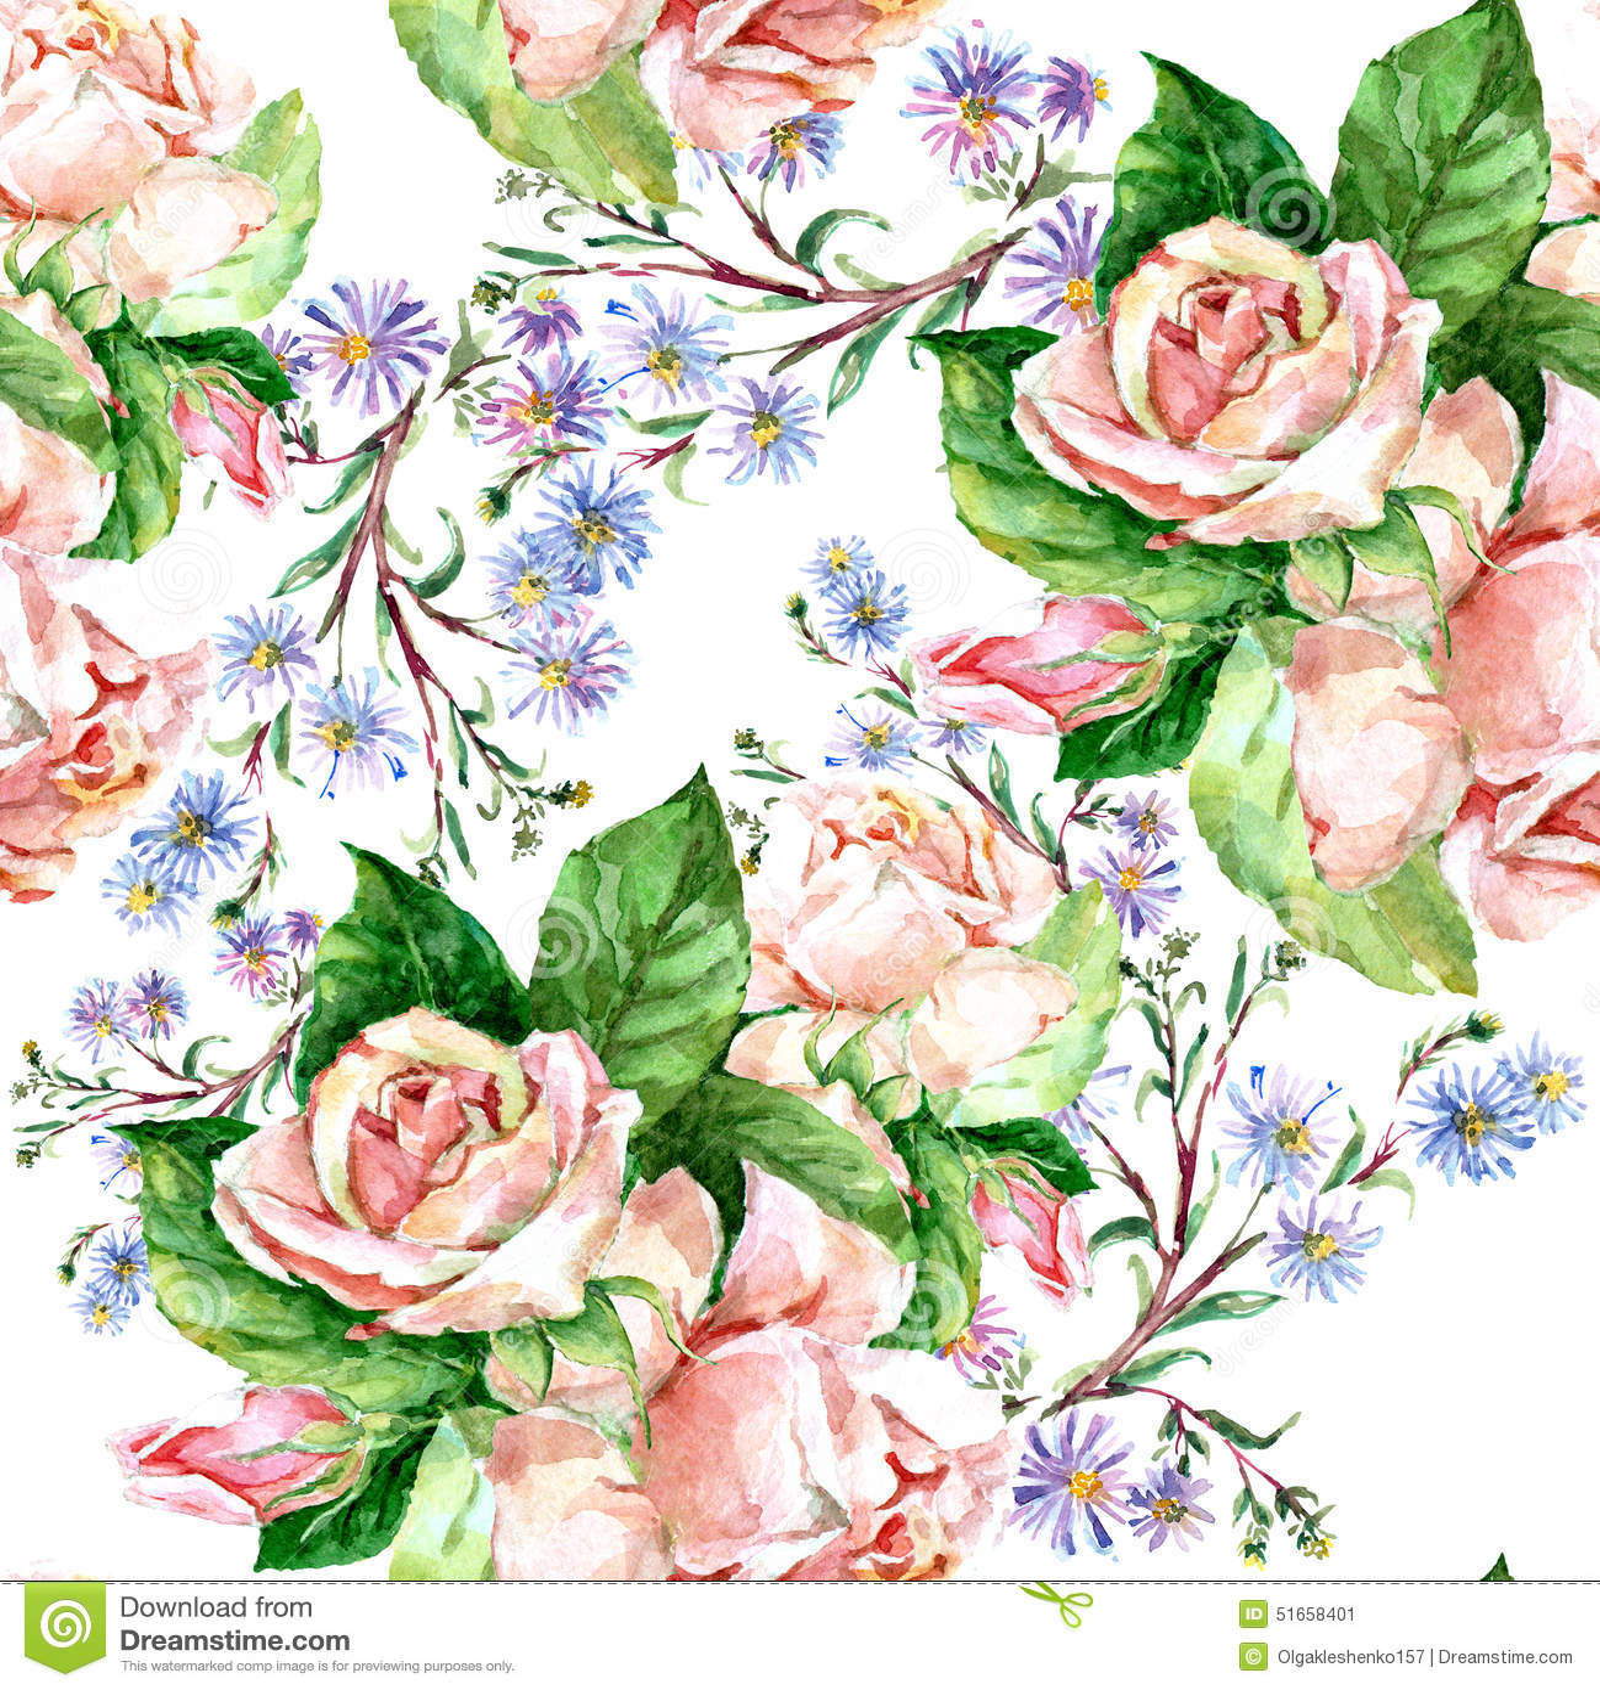 blaue blumen und rosen aquarell stock abbildung bild 51658401. Black Bedroom Furniture Sets. Home Design Ideas